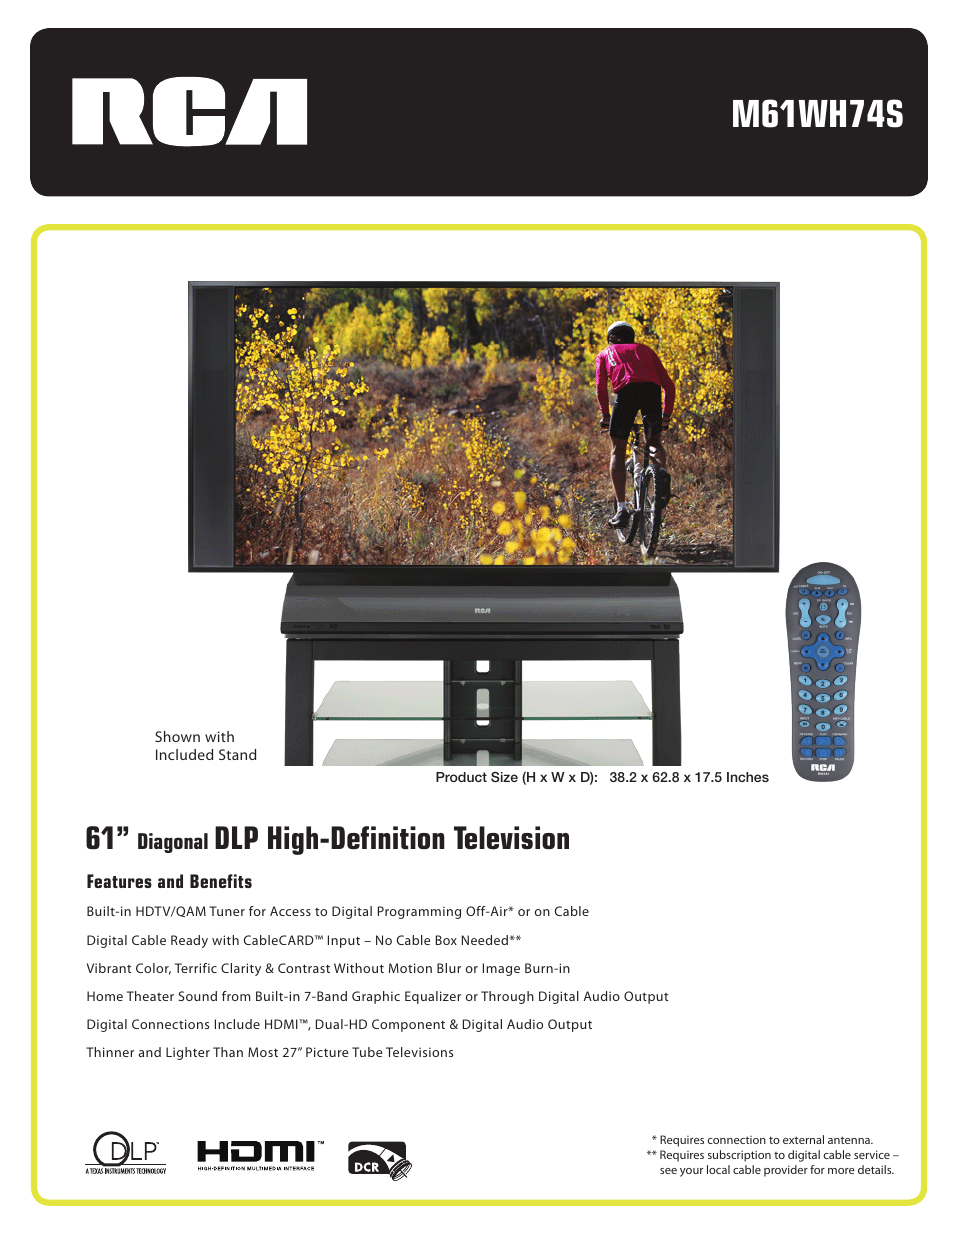 rca m61wh74s user manual 2 pages rh manualsdir com RCA DLP 50 RCA 60 DLP TV